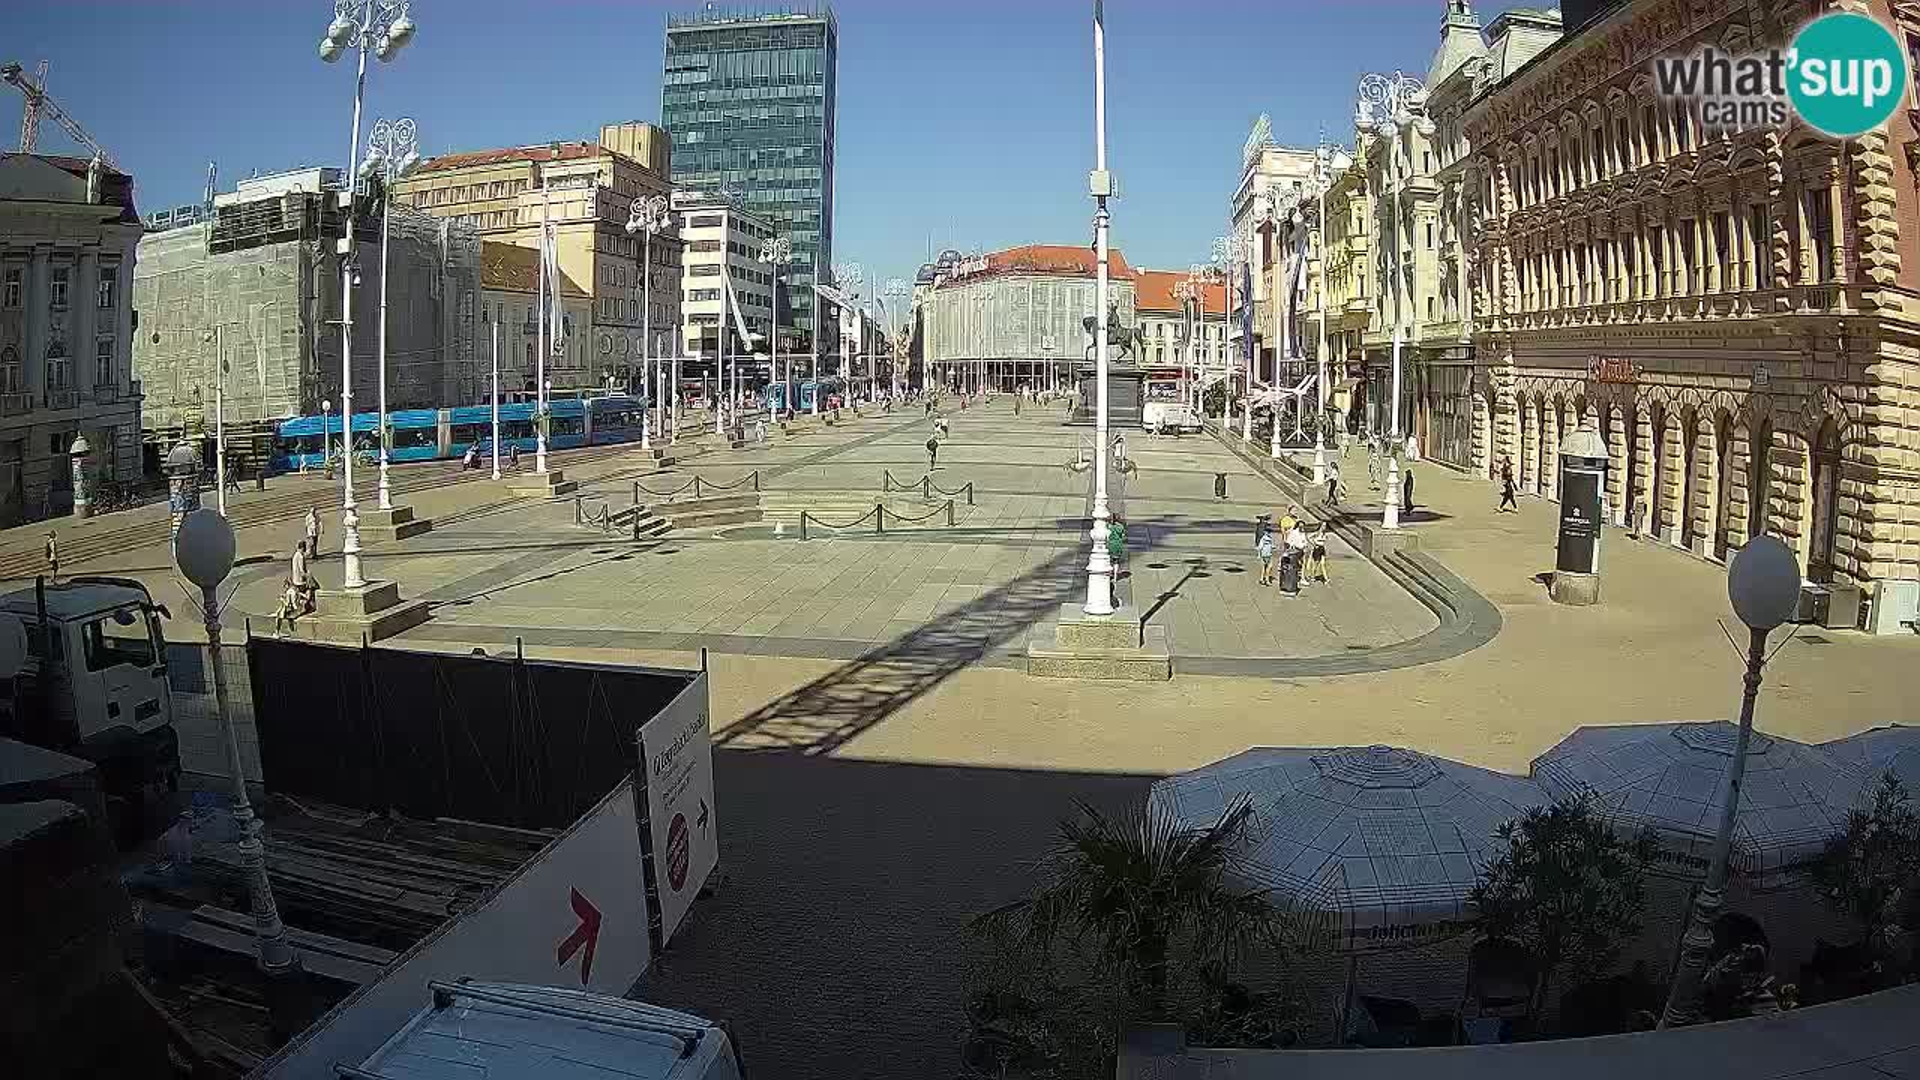 Zagreb Mon. 10:36